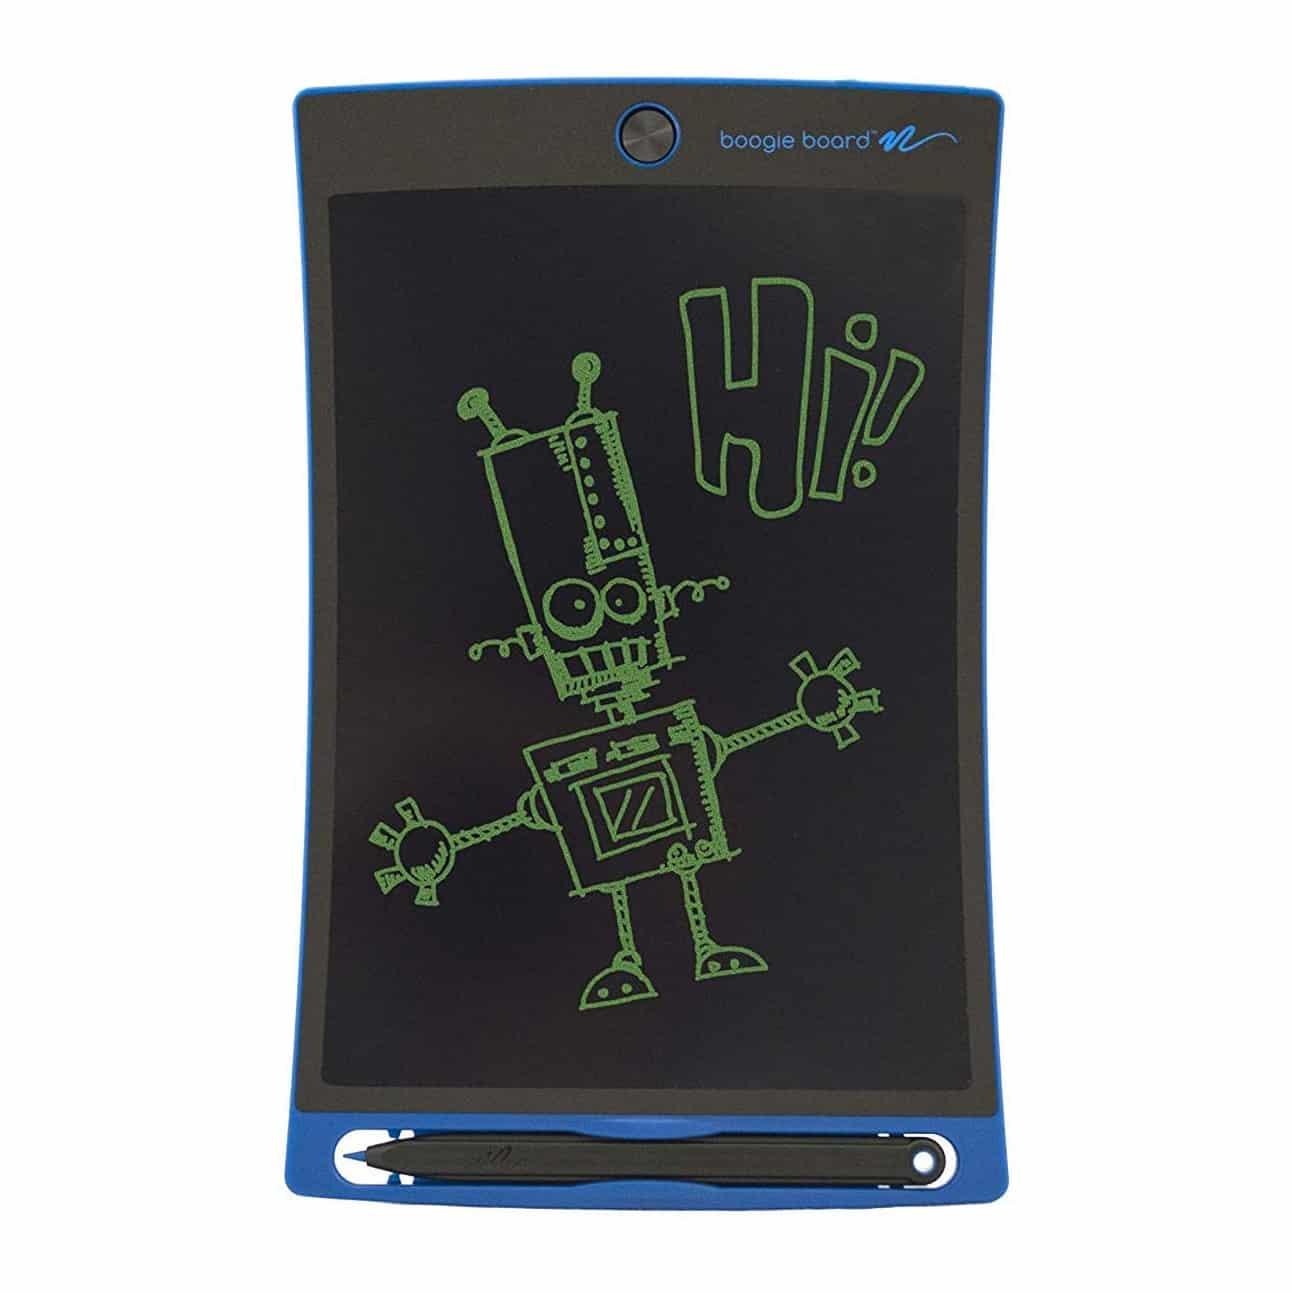 Boogie Board Jot 8.5 LCD Writing Tablet